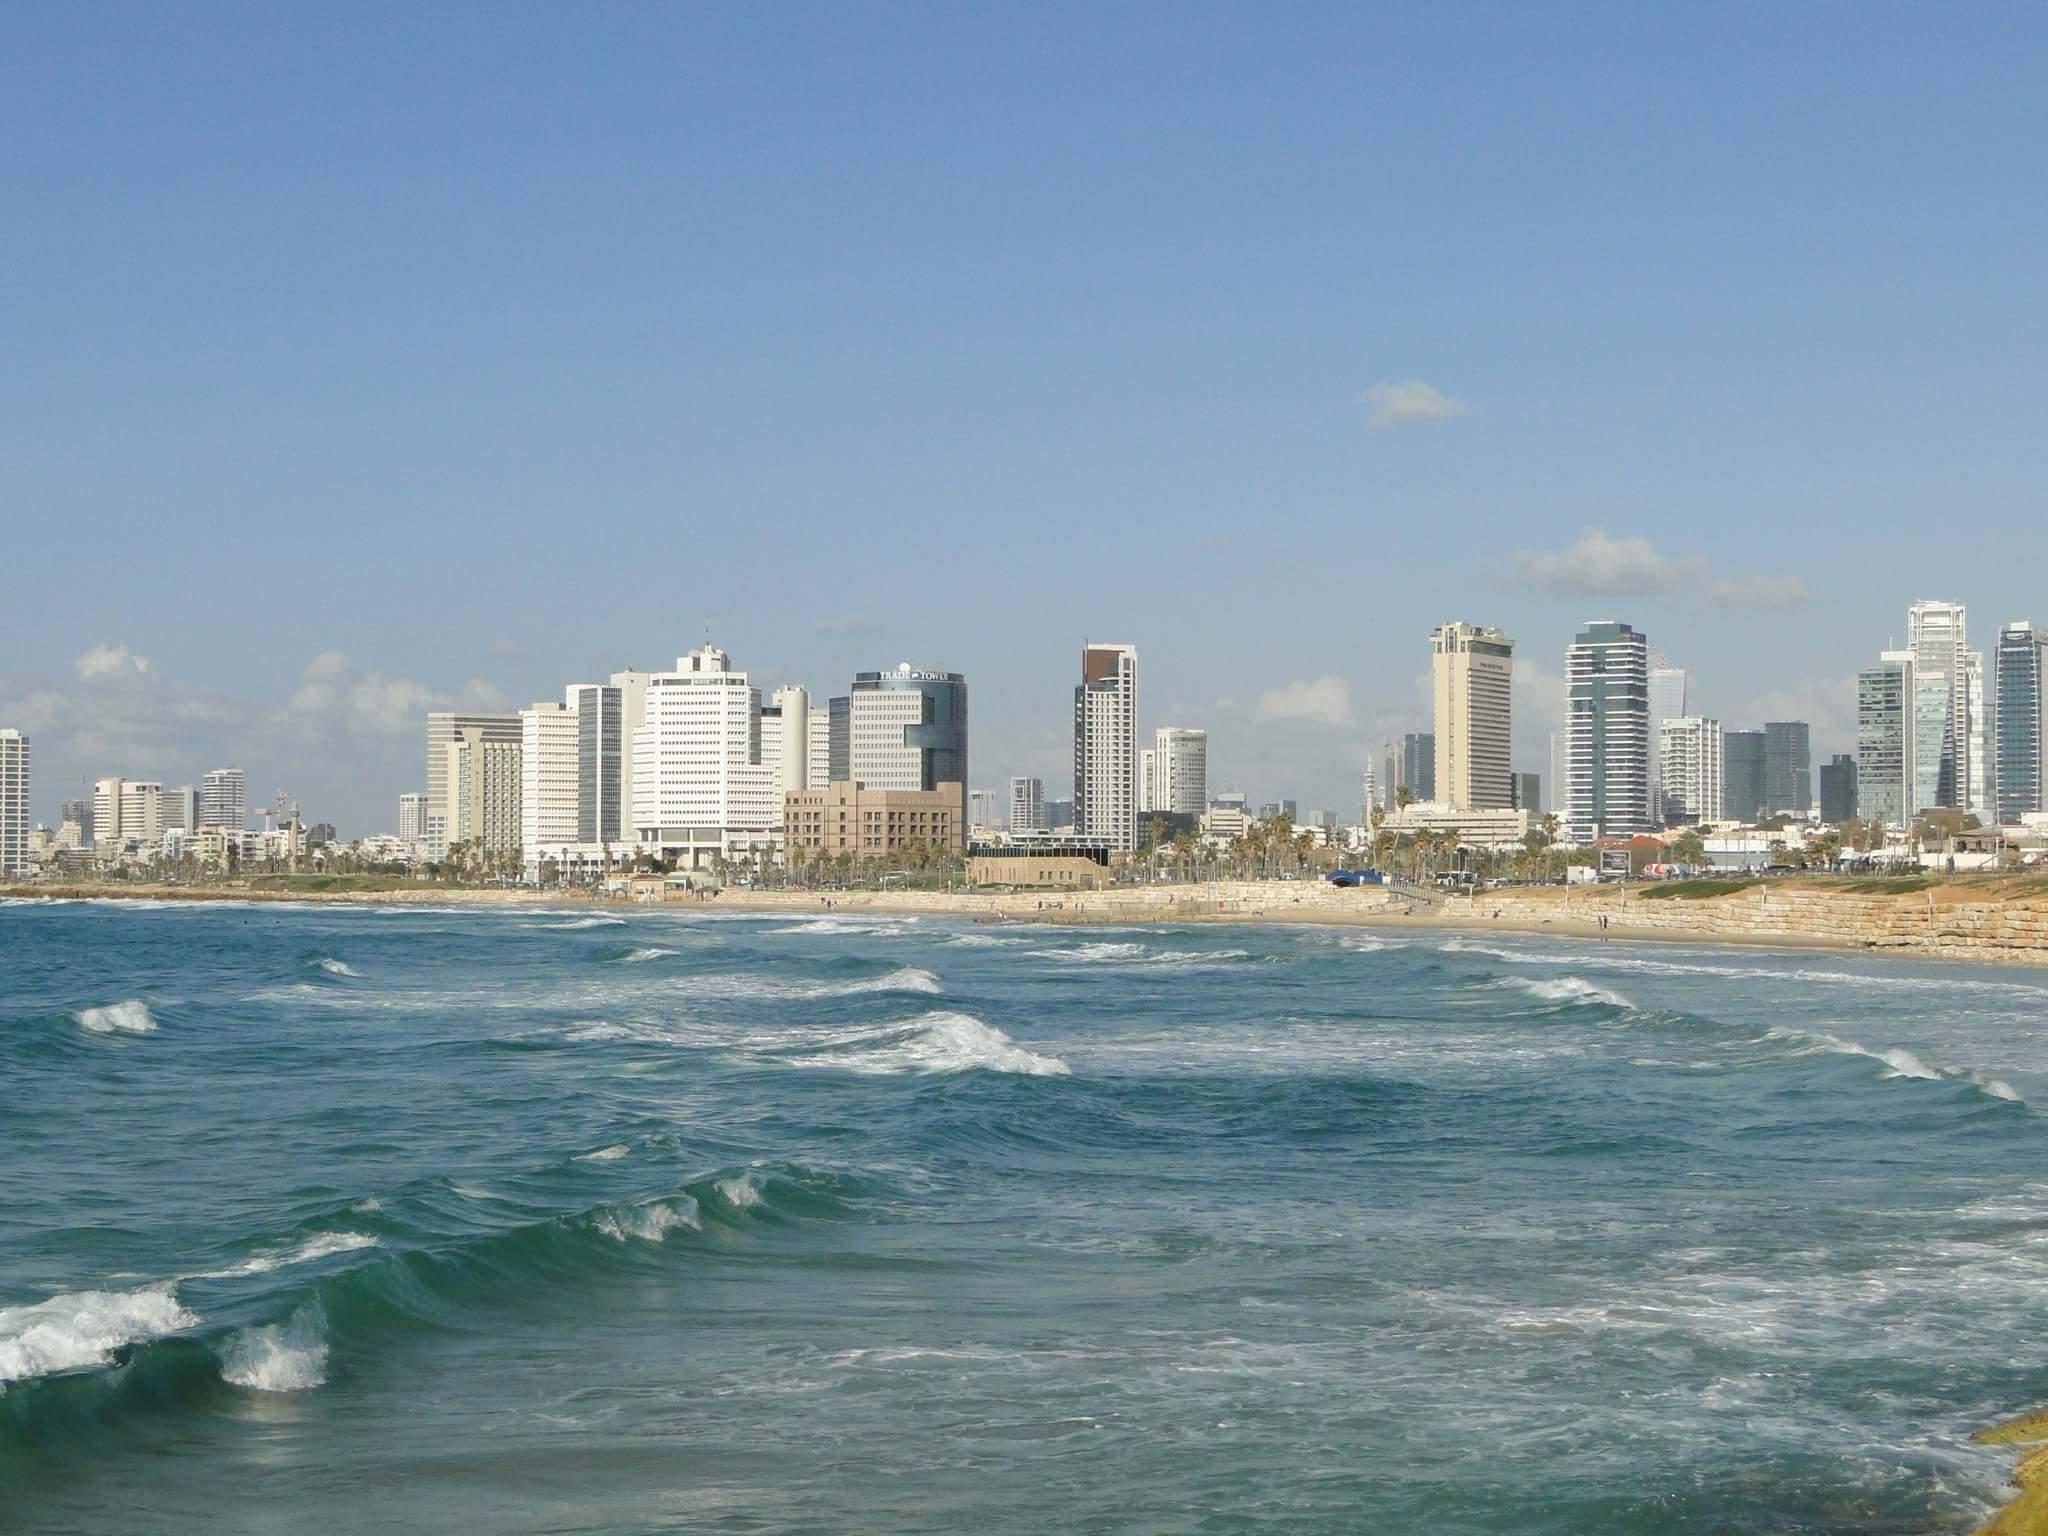 Tel Aviv's skyline and beaches